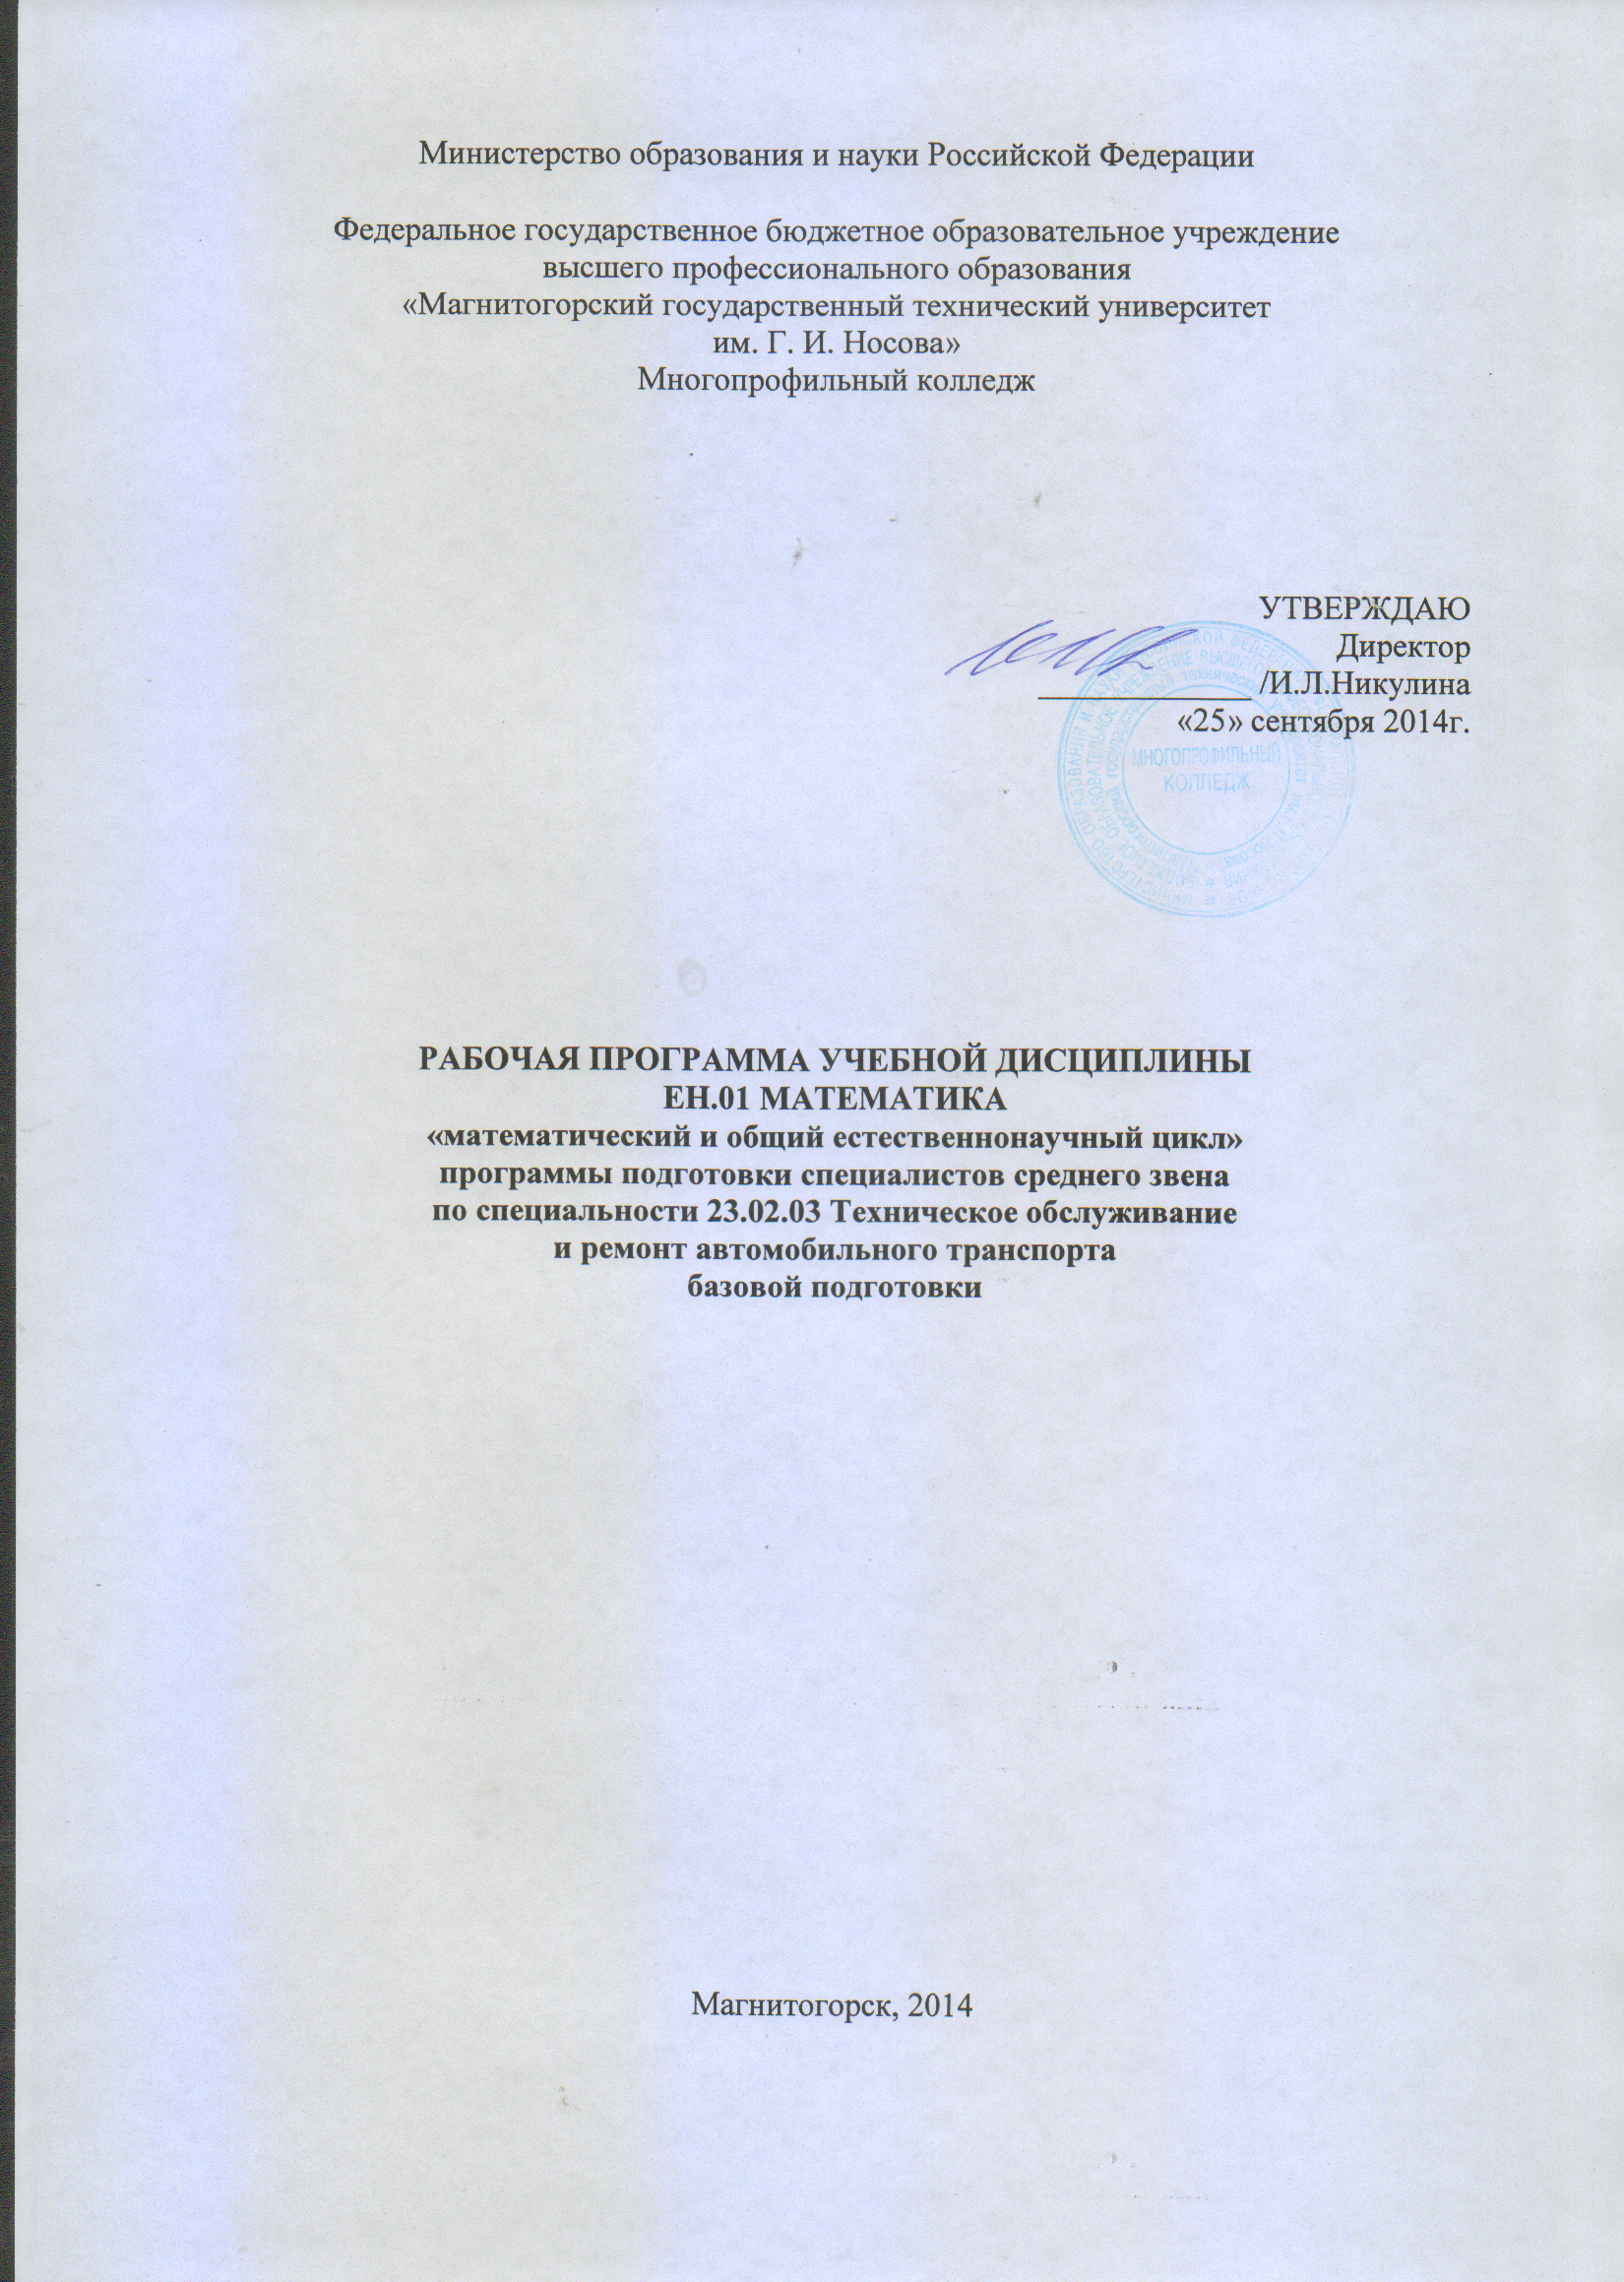 D:\Documents and Settings\m.shemetova\Рабочий стол\сканы\230203\21.bmp